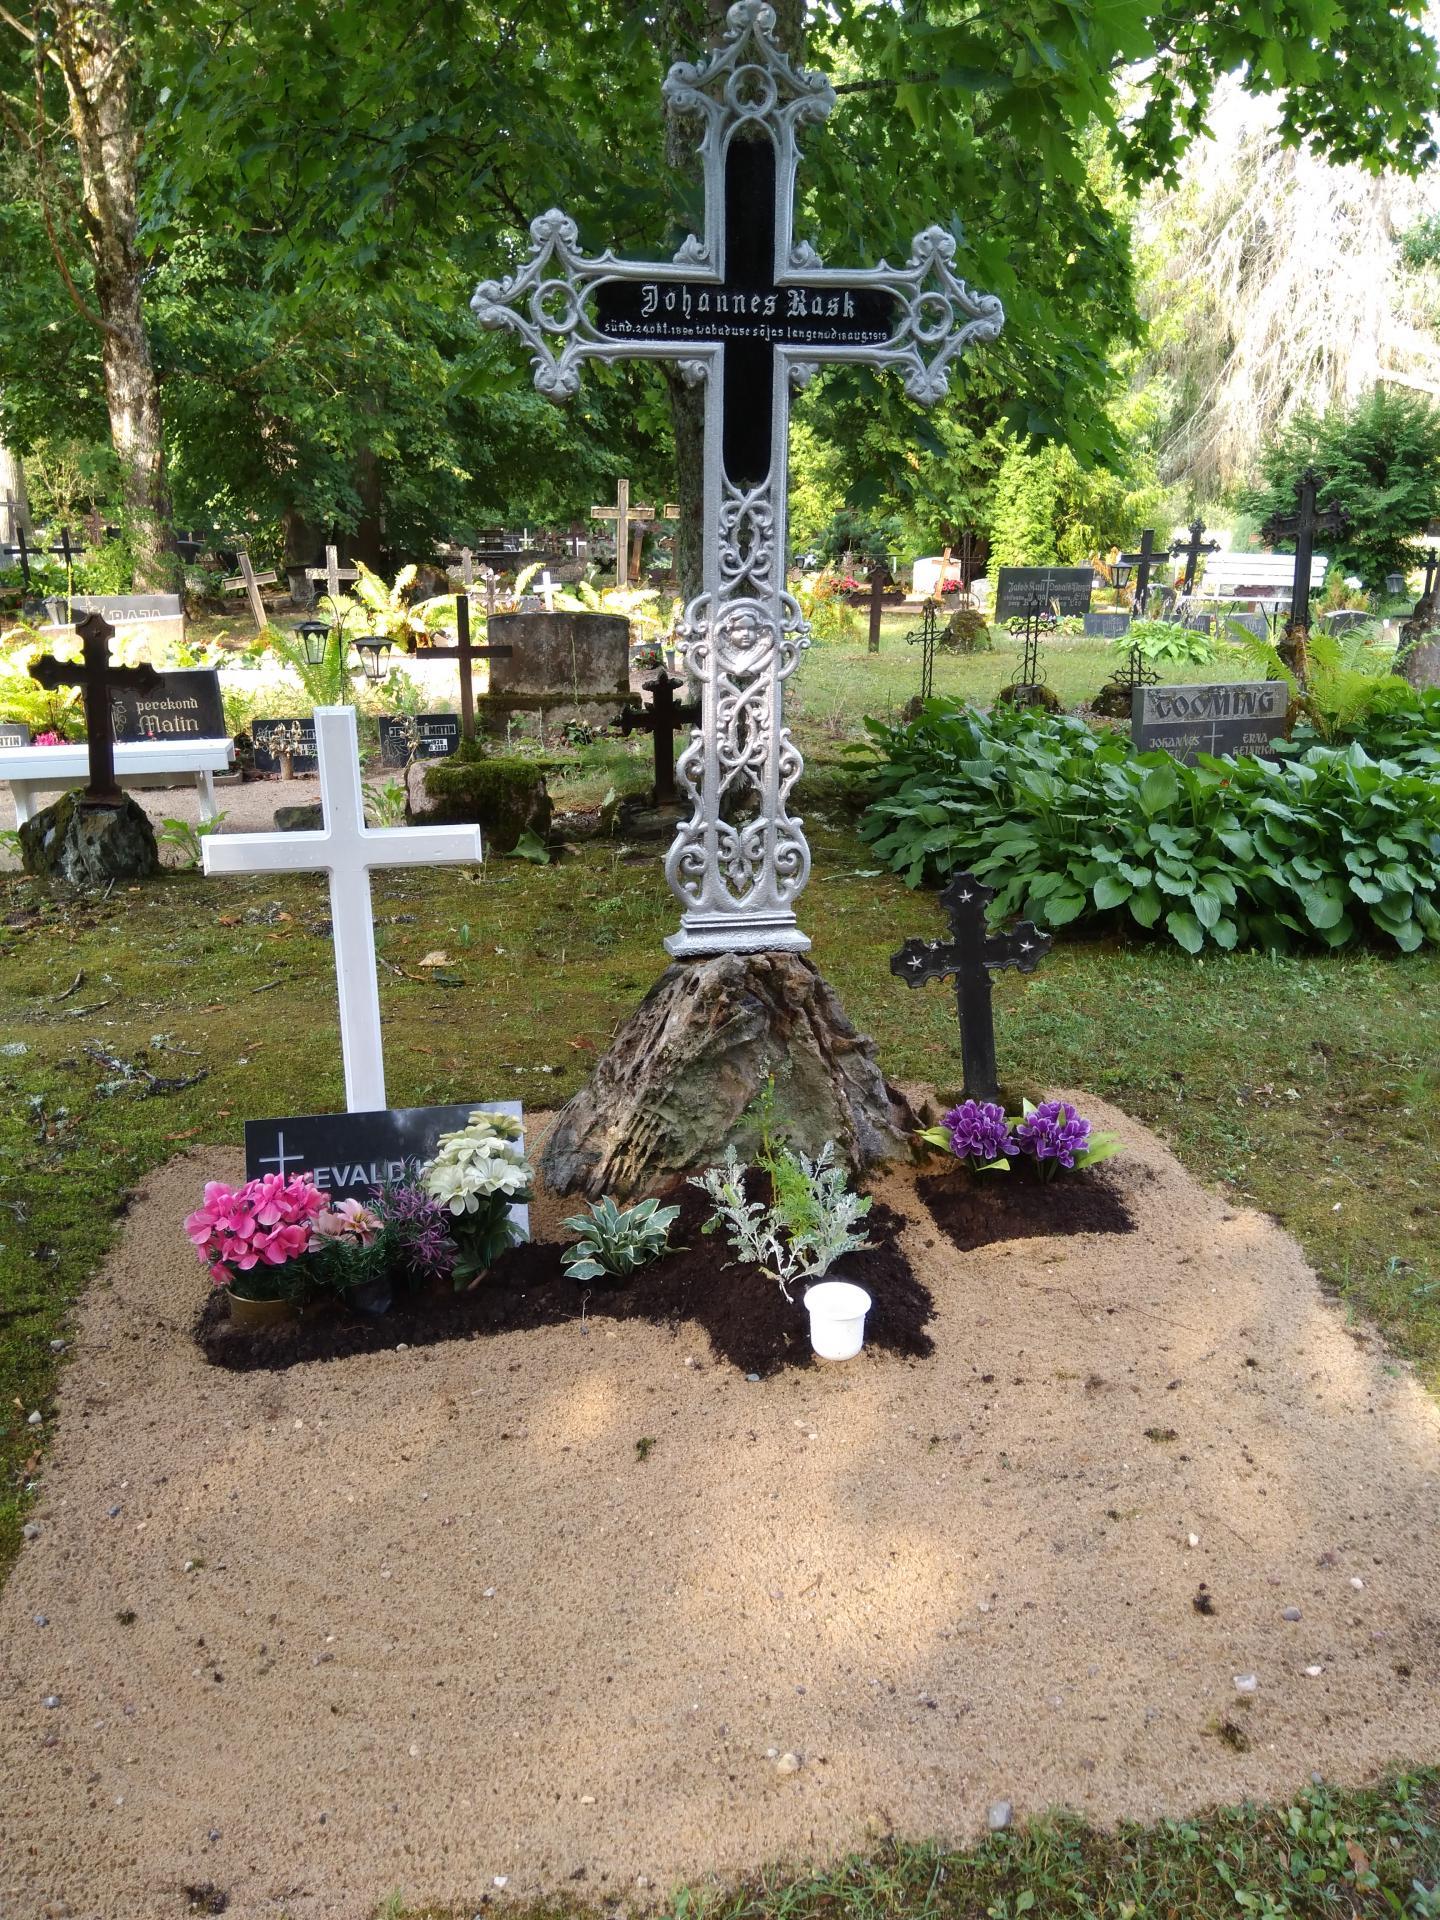 https://www.haudi.ee/uploads/burialplace_5bd1f0891c141.jpg